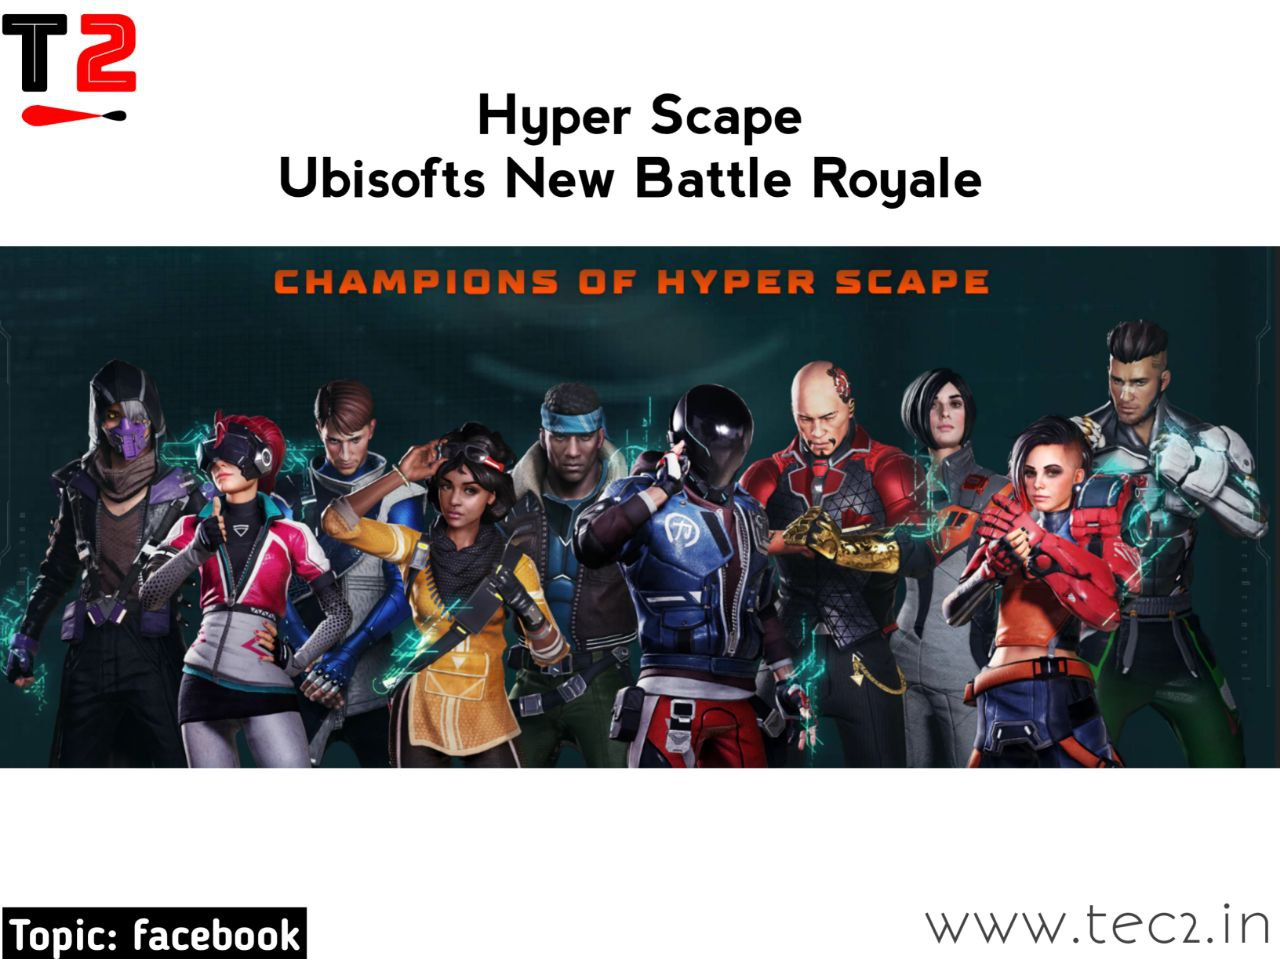 Ubisoft Hyper Scape